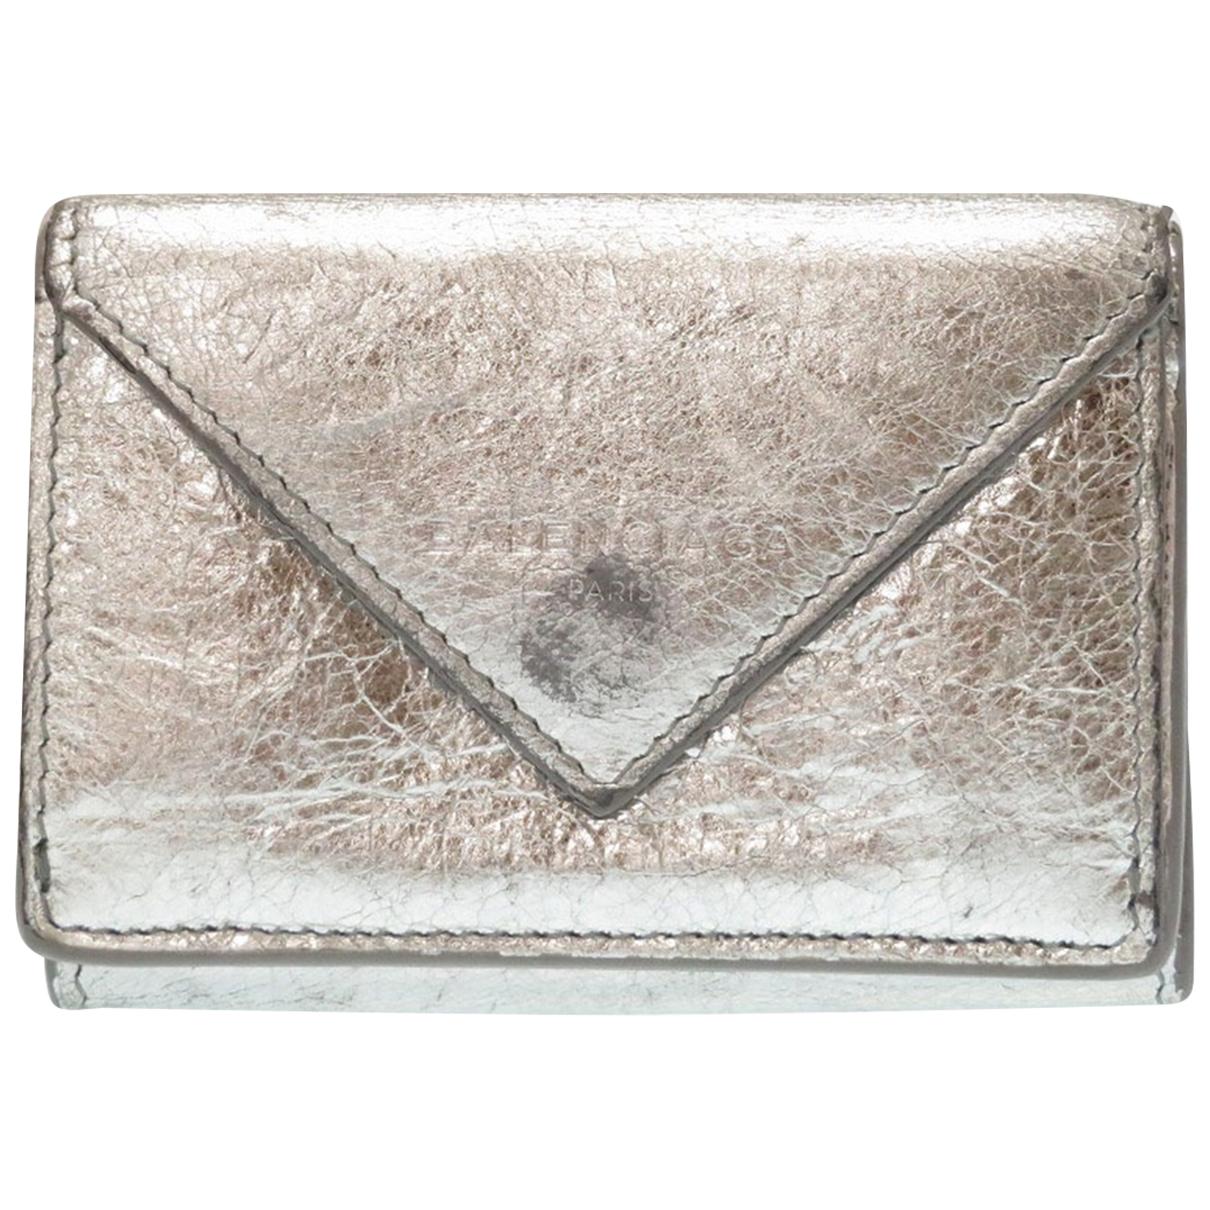 Balenciaga - Portefeuille   pour femme en cuir - argente